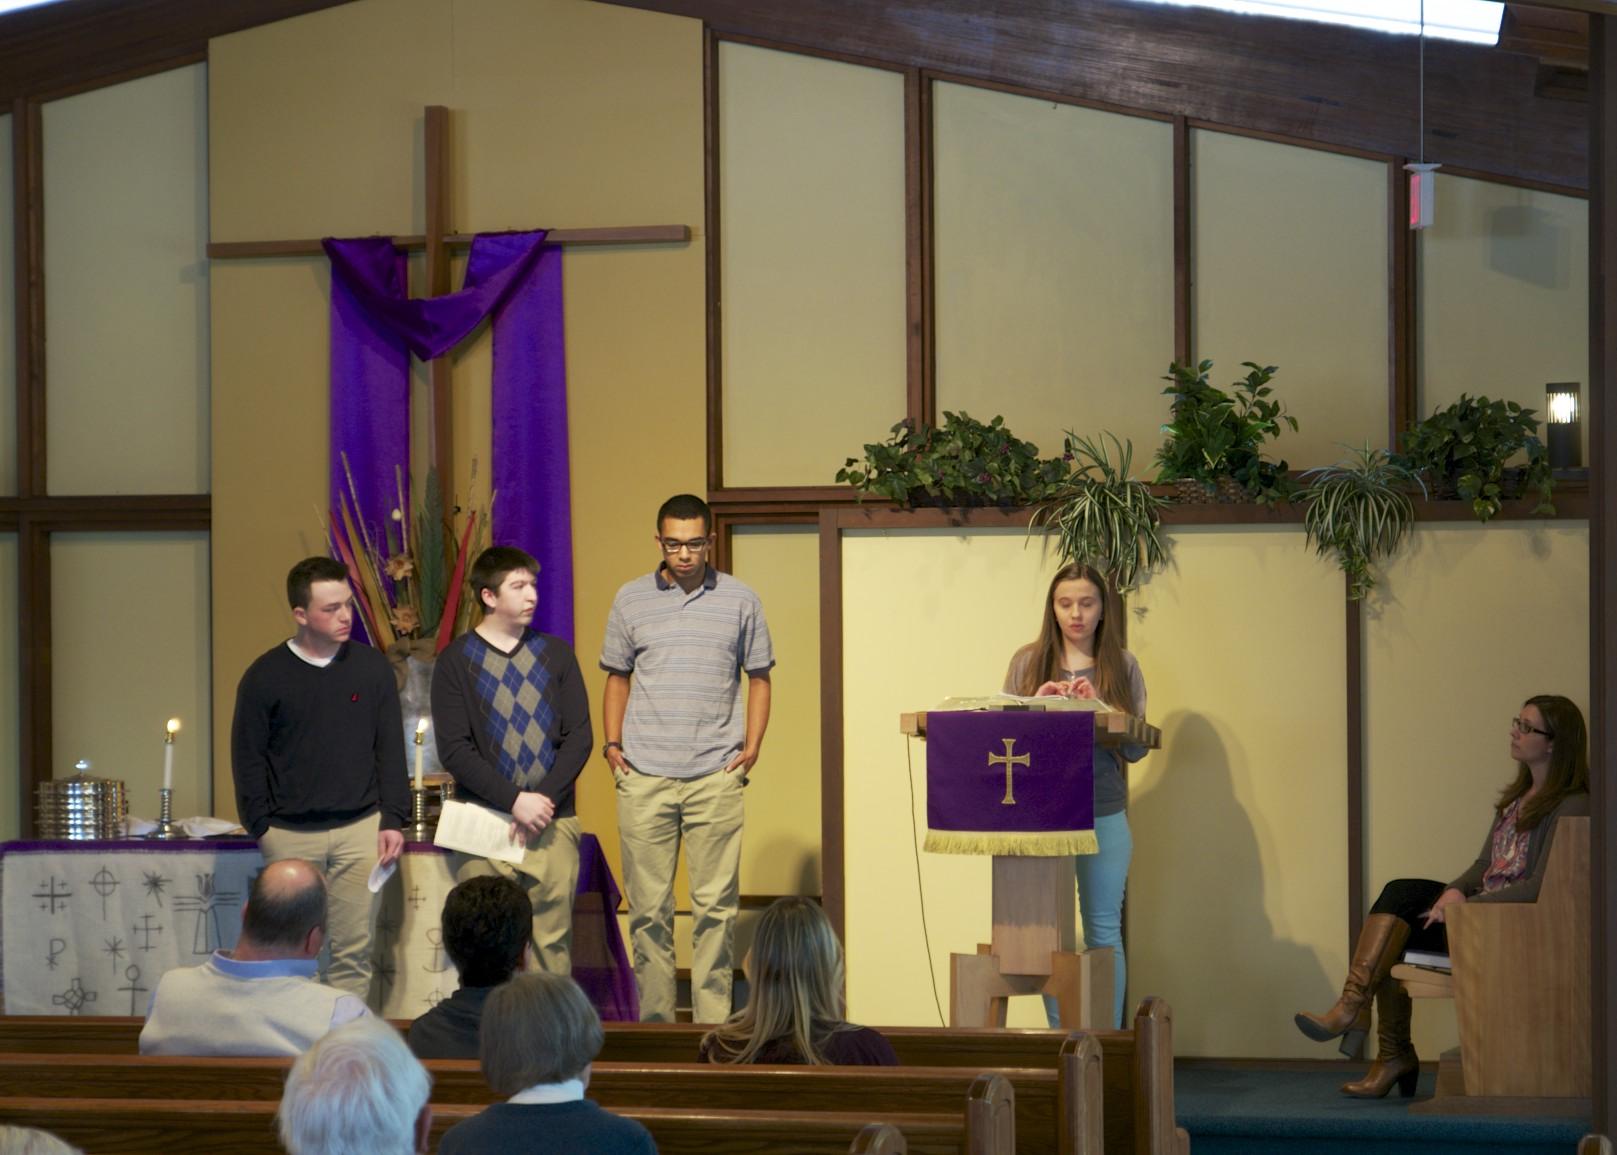 RPMs Service 3-1-2015 Cameron,Chris,Andreas,Hannah,Beth.jpg